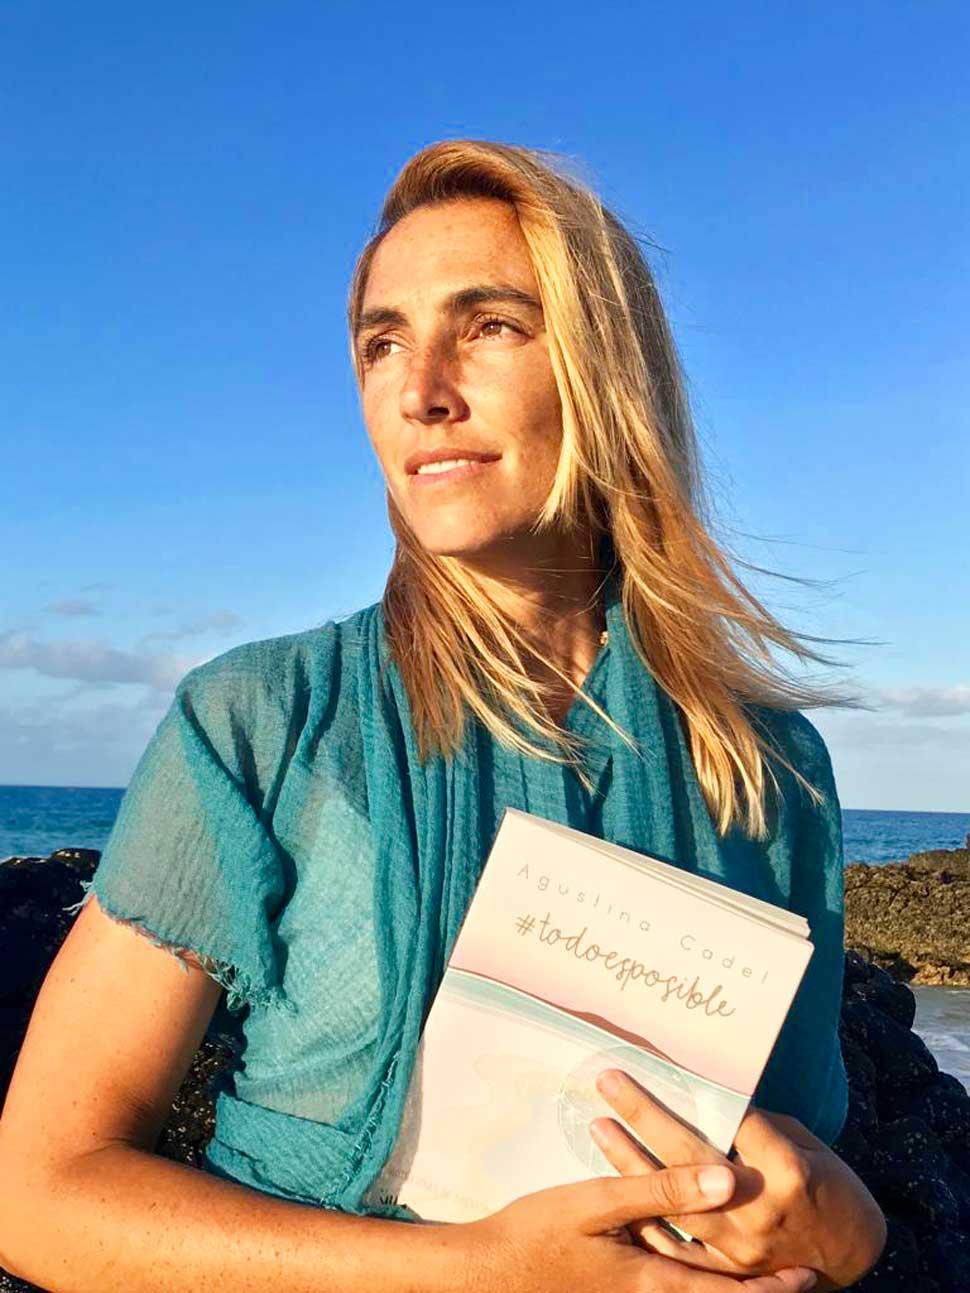 #todoesposible, the first novel by Agustina Cadel | Macaronesia Fuerteventura